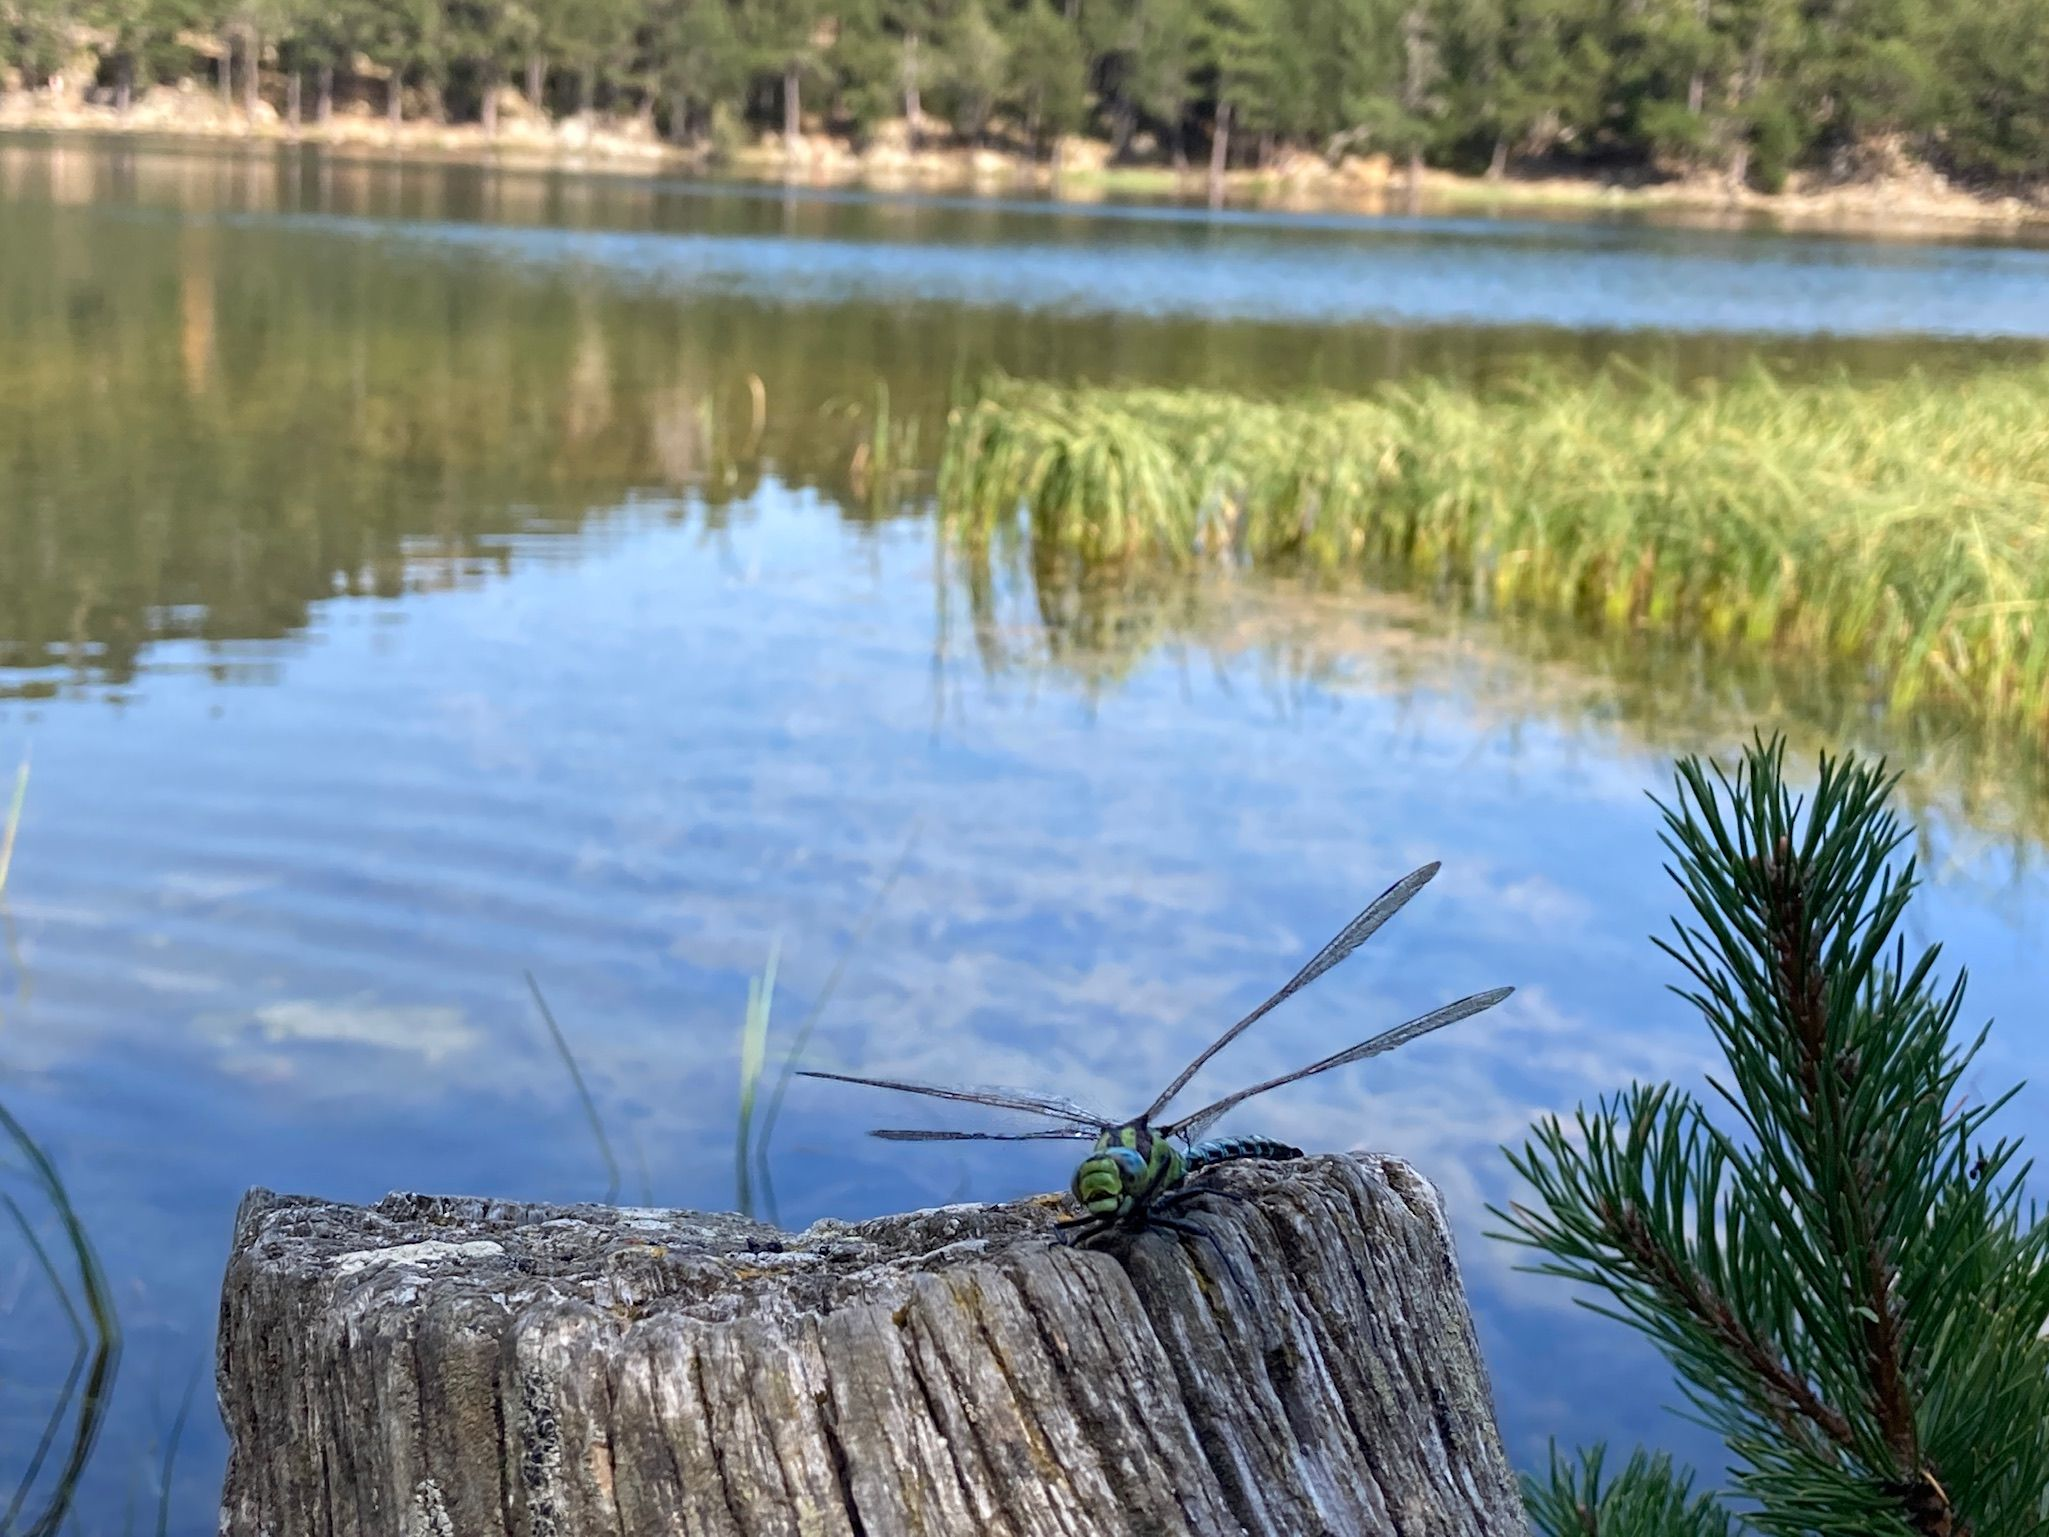 Libélula en un llac Francia, lac de Balcère#Xavier Moreno i Navarro 173